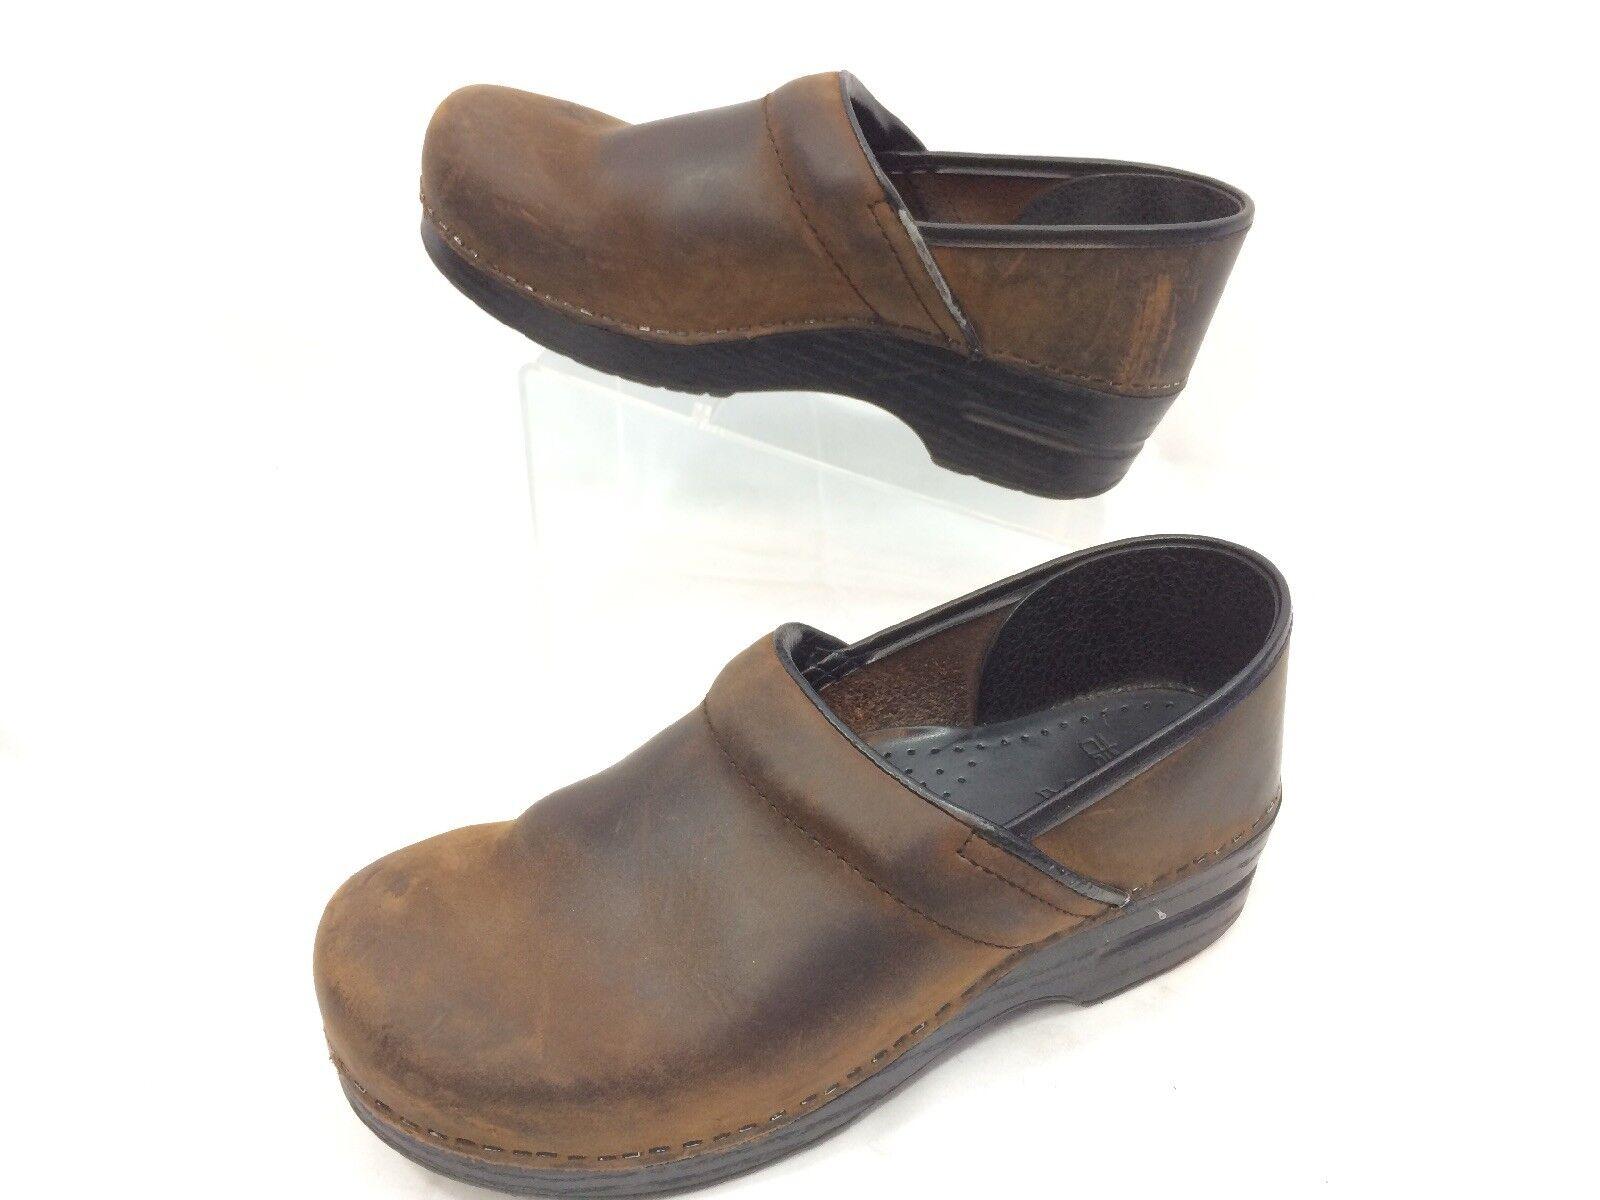 Dansko Danish Clogs Size 40 US 9.5 - 10 10 - Slip On Brown Shoes 33716f